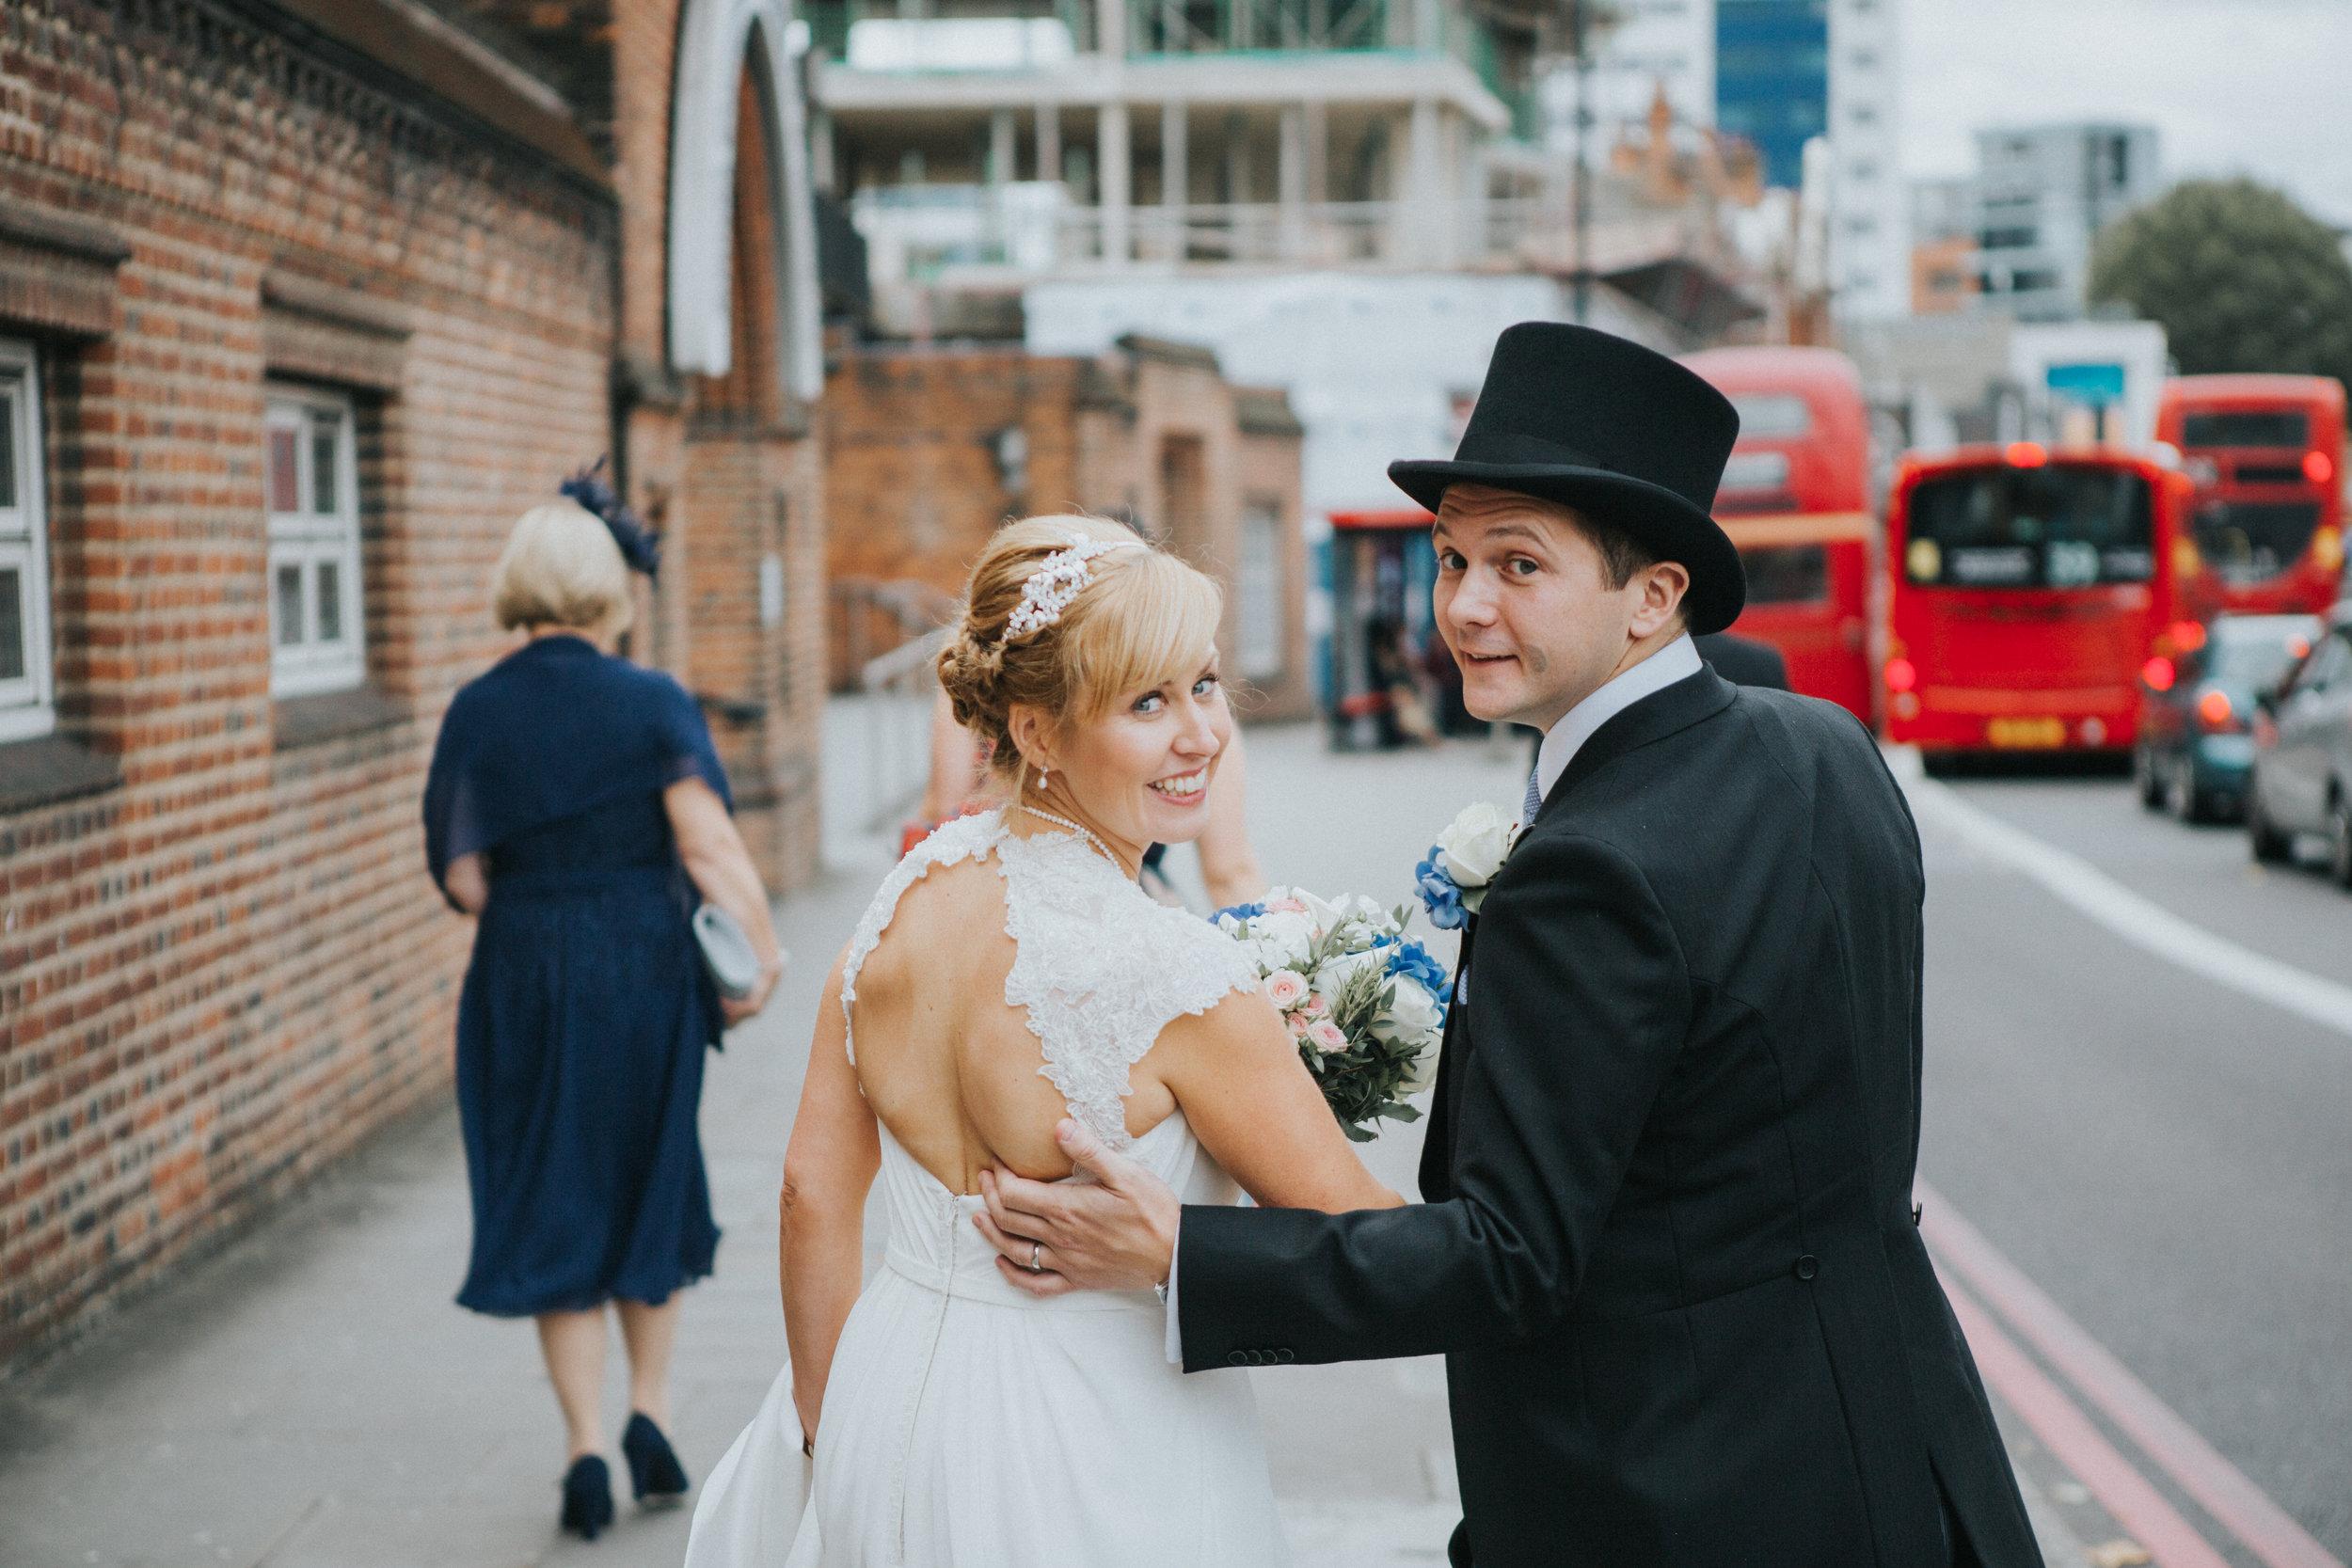 london-wedding-photography-wimbledon-wandsworth-town-hall-savoy-hotel-couple-portrait-57